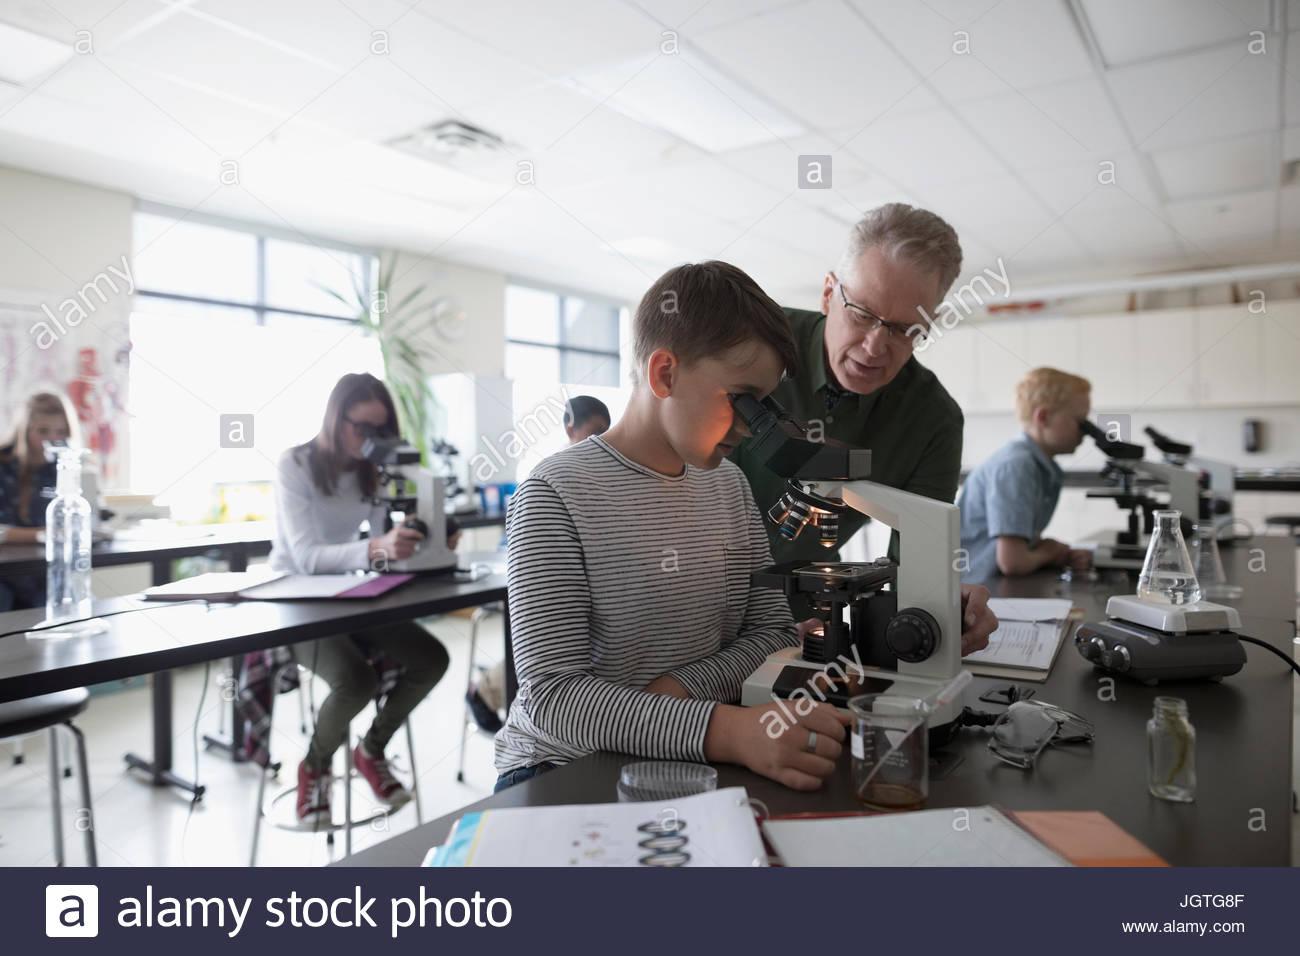 Biologieausbildung Stockfotos & Biologieausbildung Bilder - Alamy